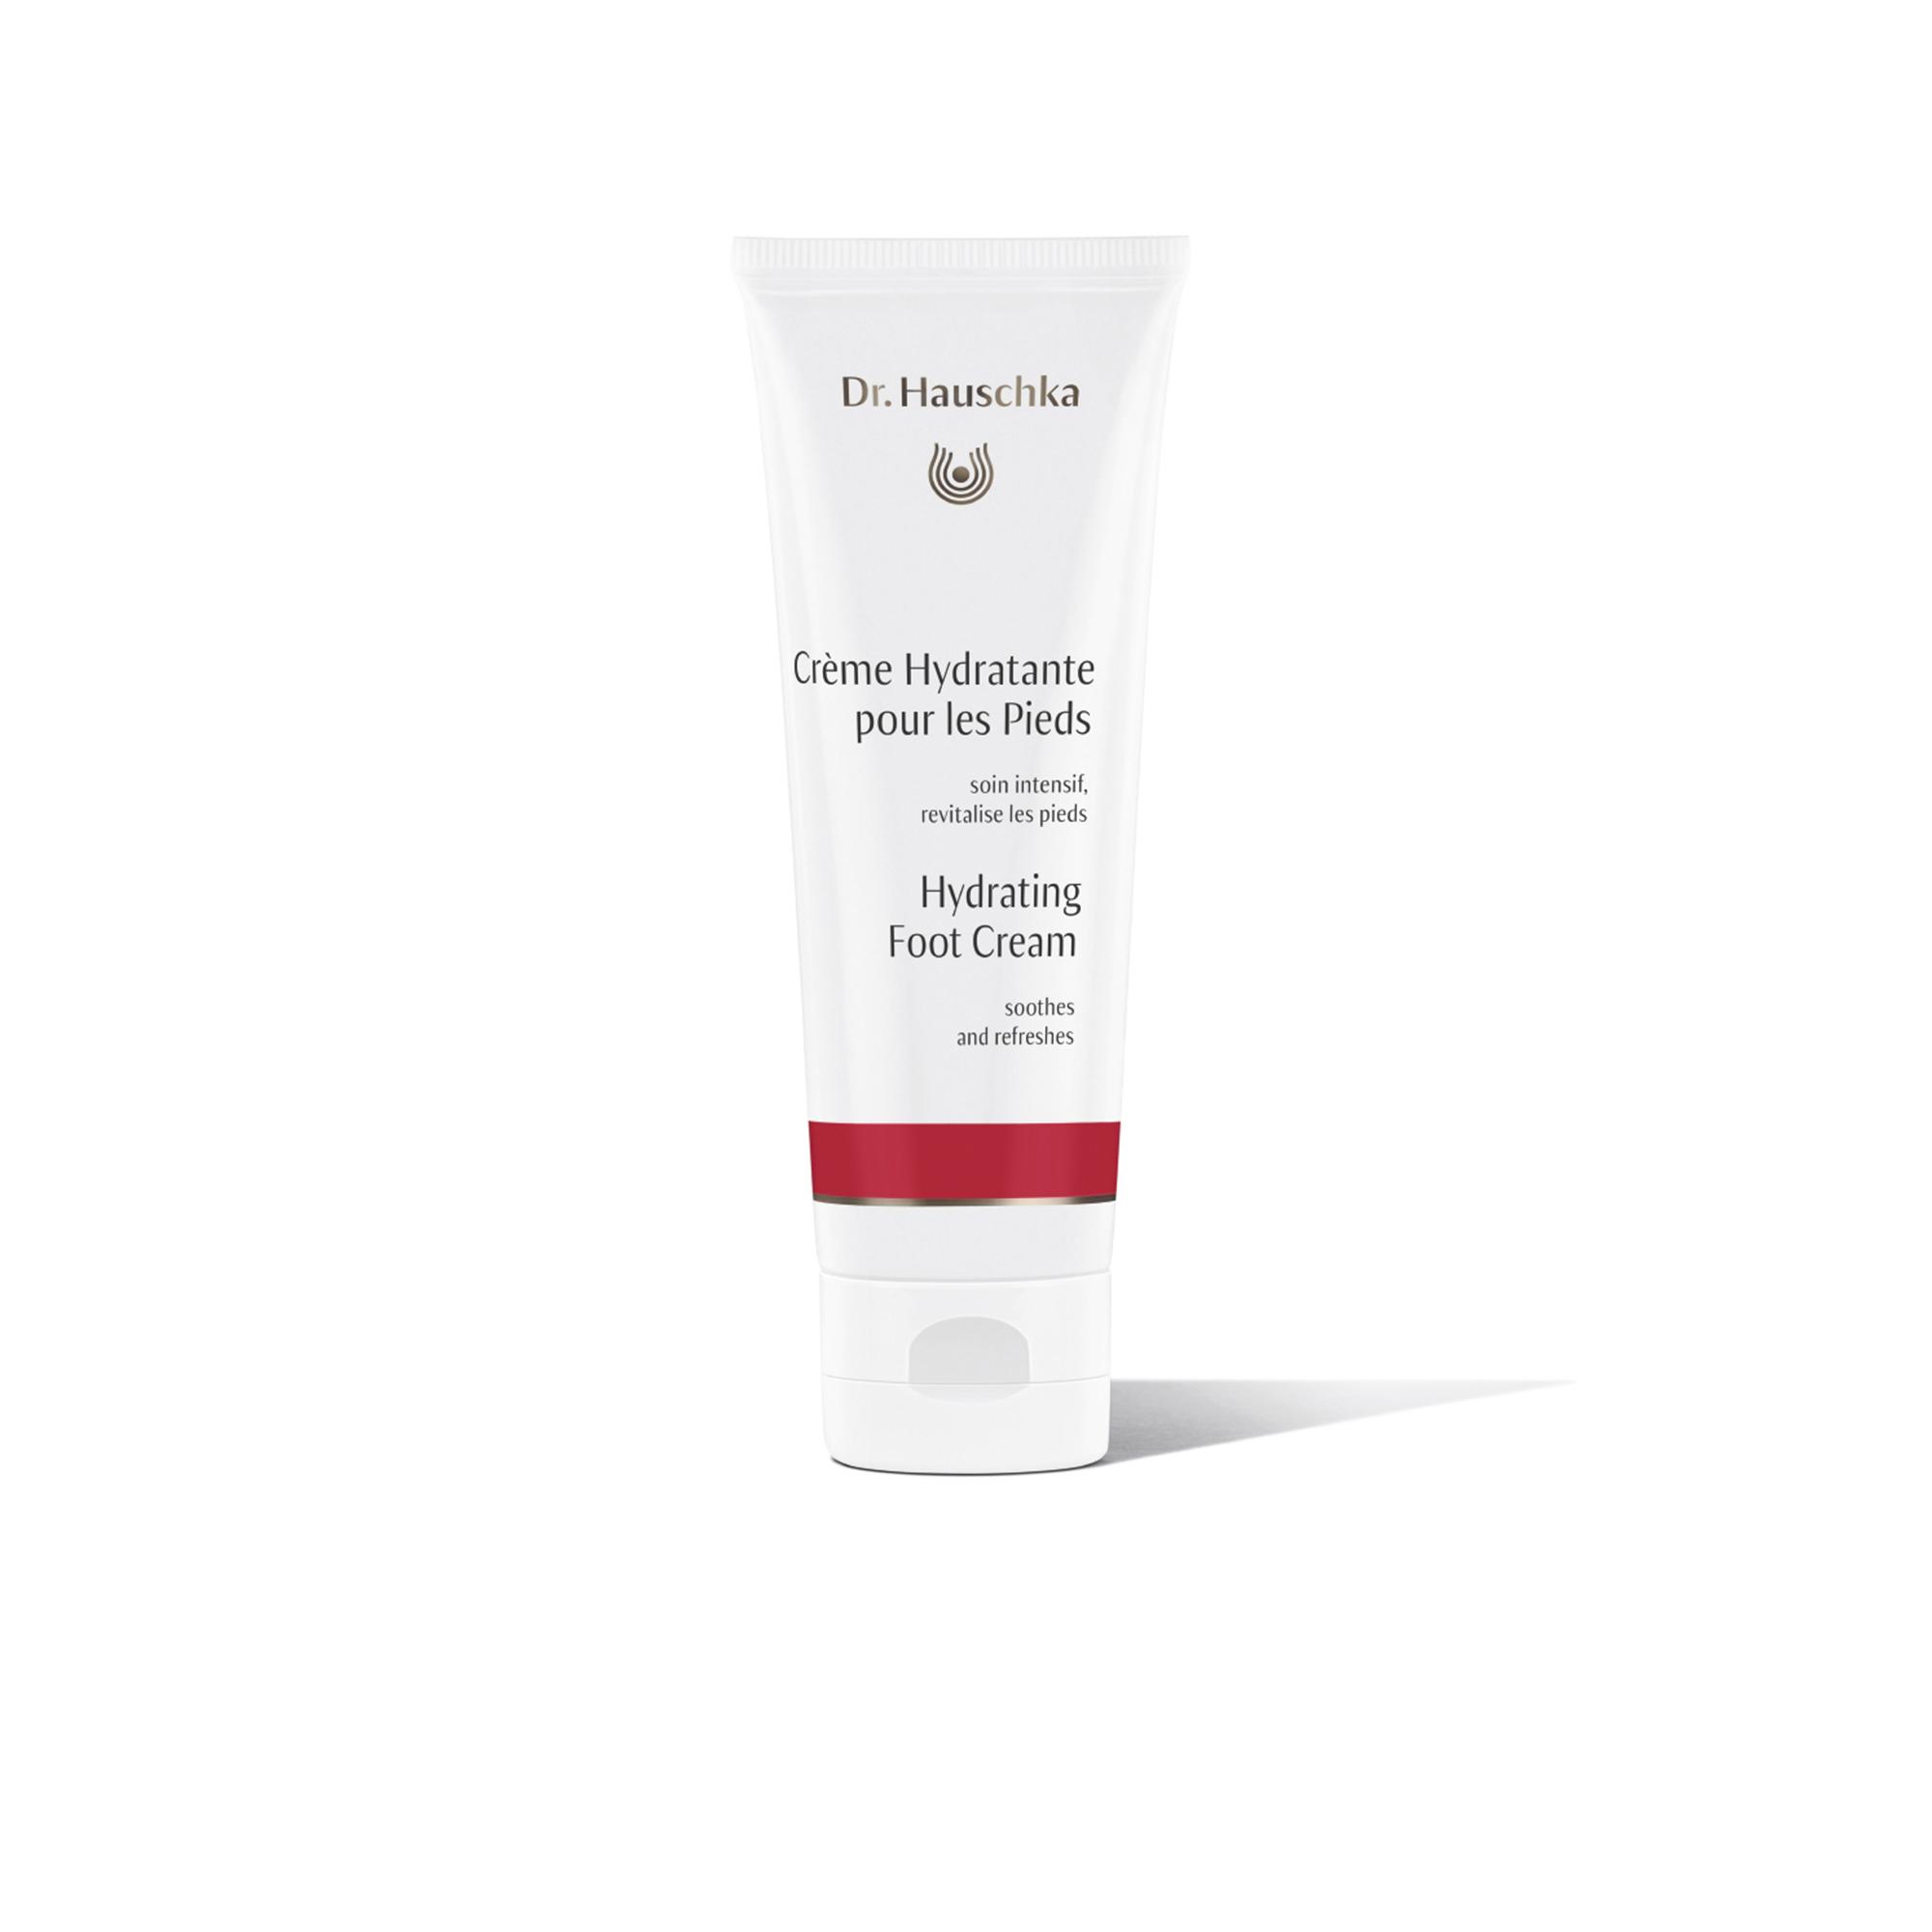 Dr. Hauschka Hydrating Foot Cream, 75 ml